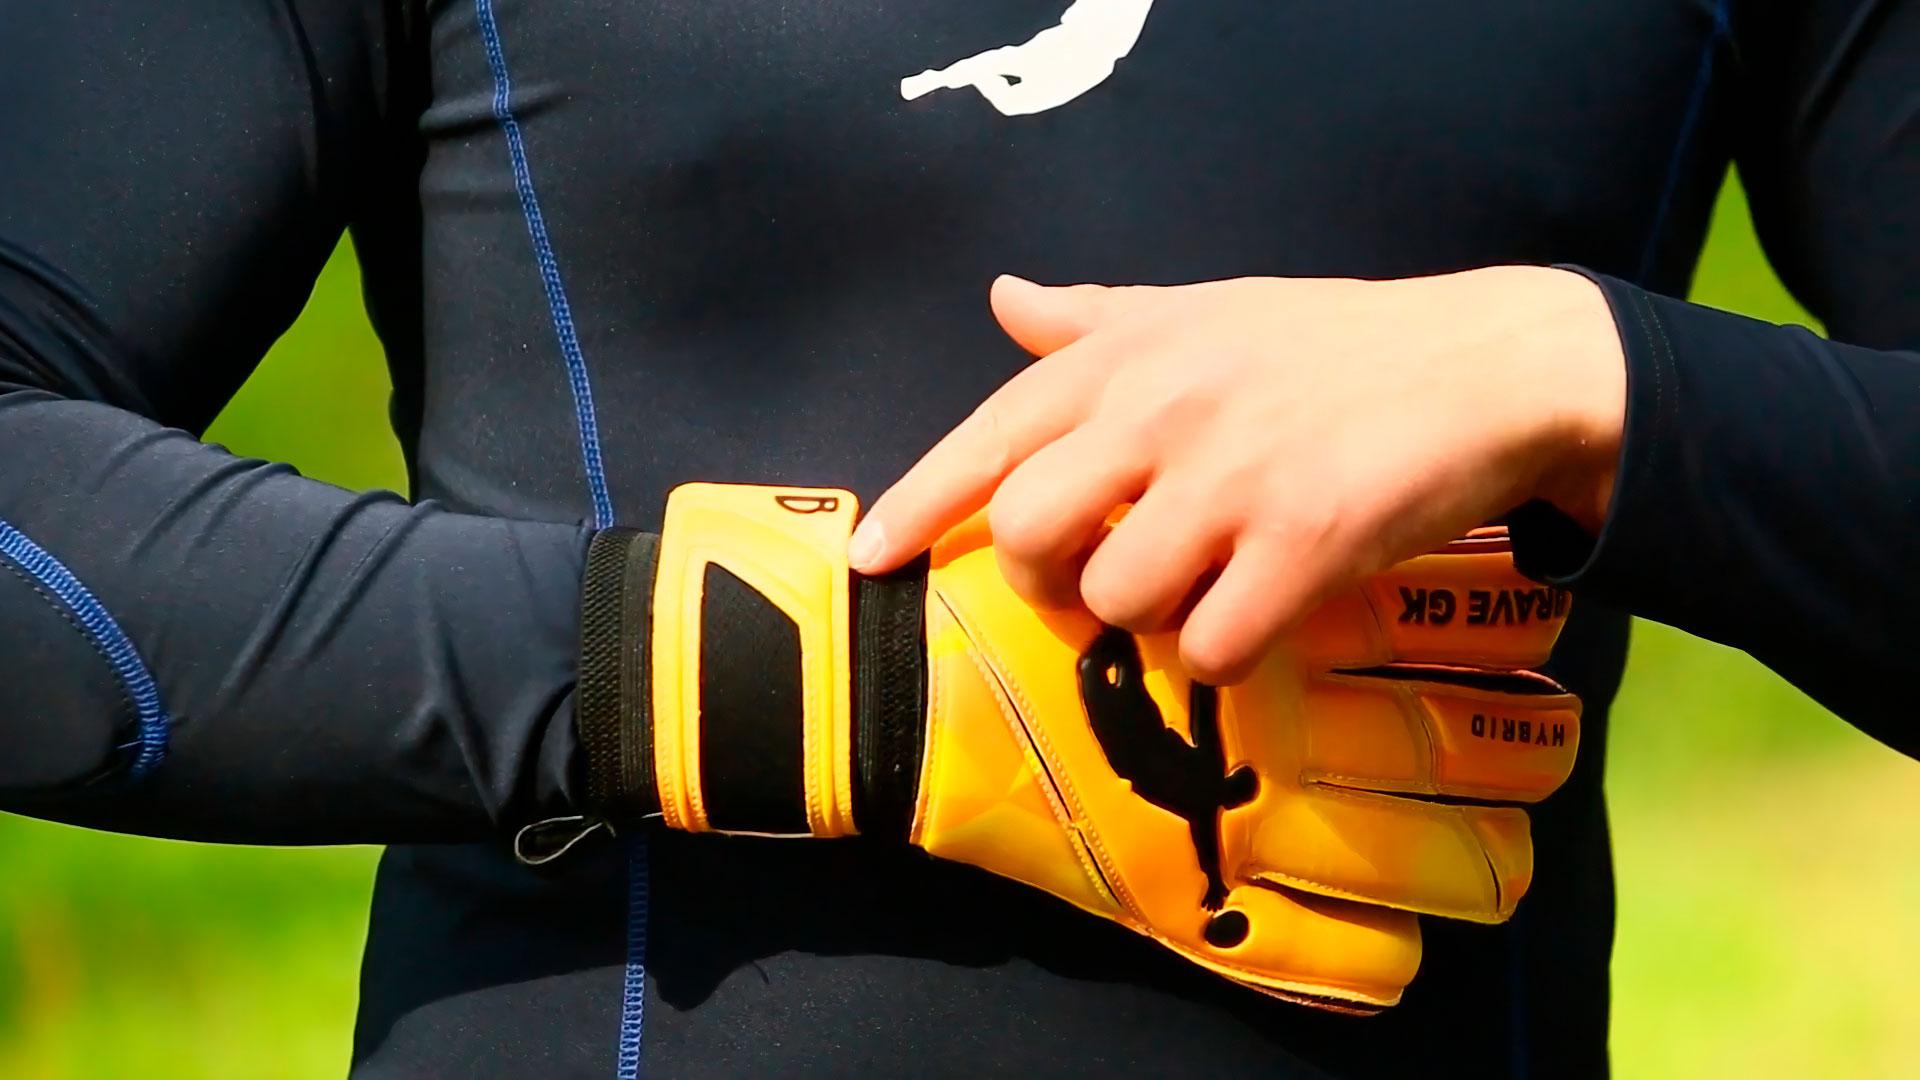 Вратарские перчатки  Brave GK Hybrid-официальный интернет-магазин Brave GK